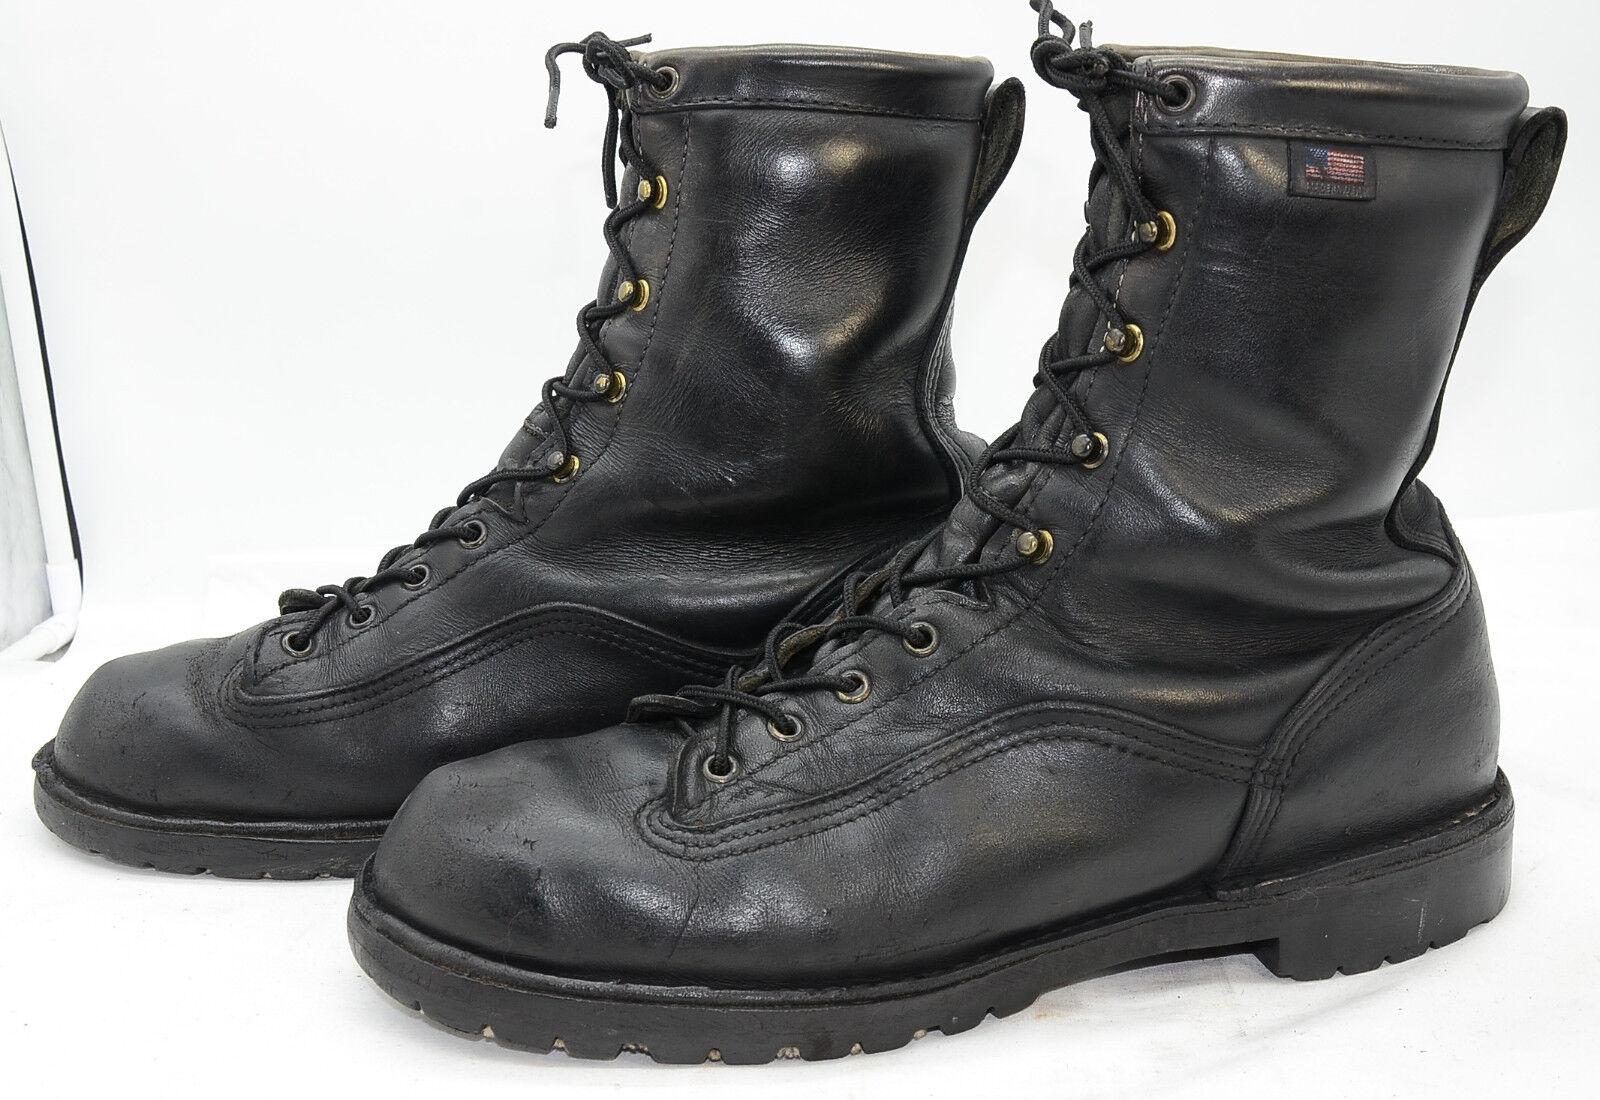 Danner Super Rain Forest 11500 Mens Sz 12 GTX Leather Hunting Work Biker Boots